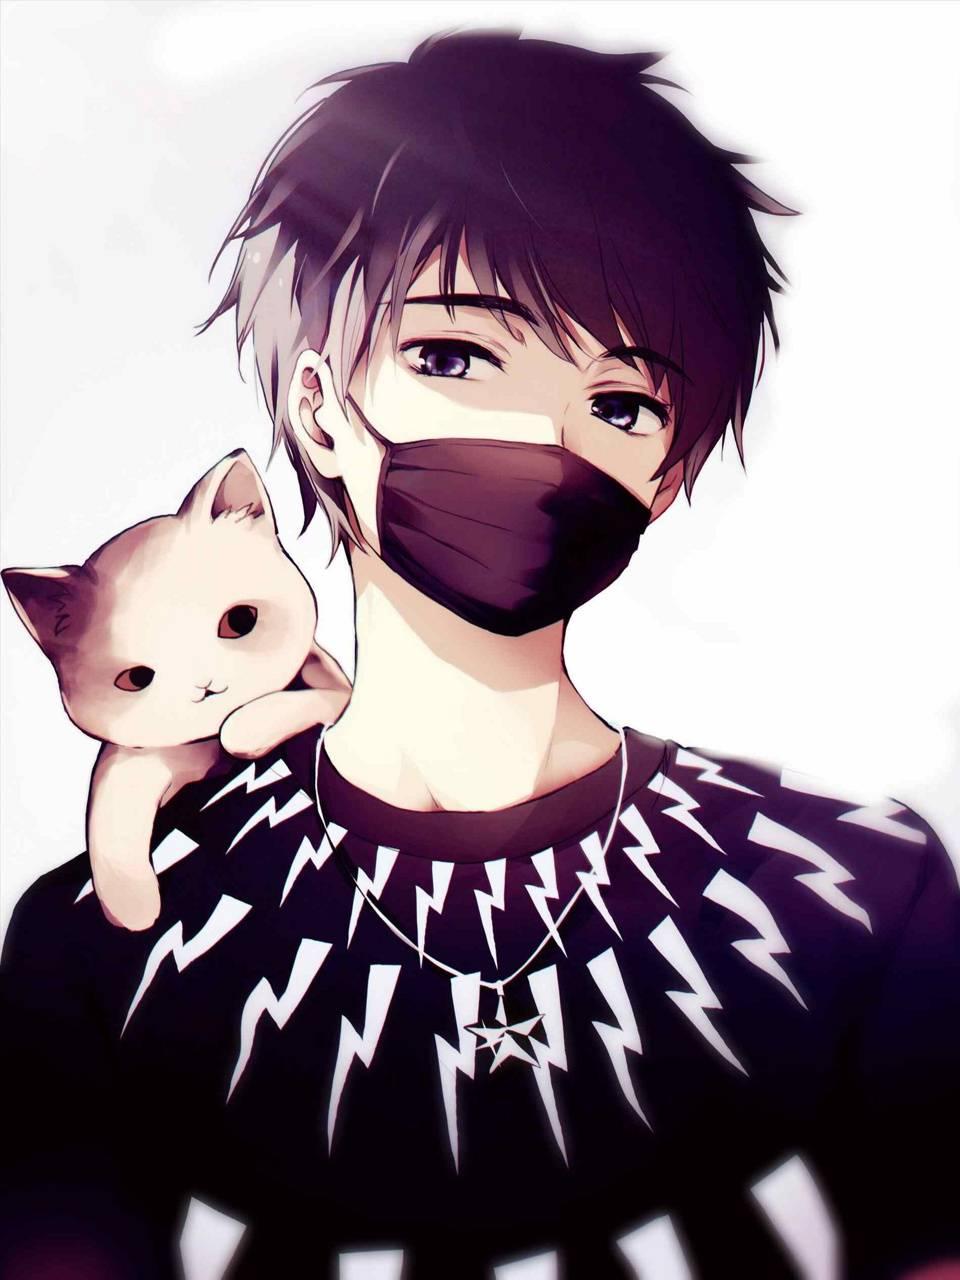 Anime Boy Wallpaper By Greatgamergabeyt Cc Free On Zedge In 2020 Anime Drawings Cute Boy Drawing Cute Anime Boy